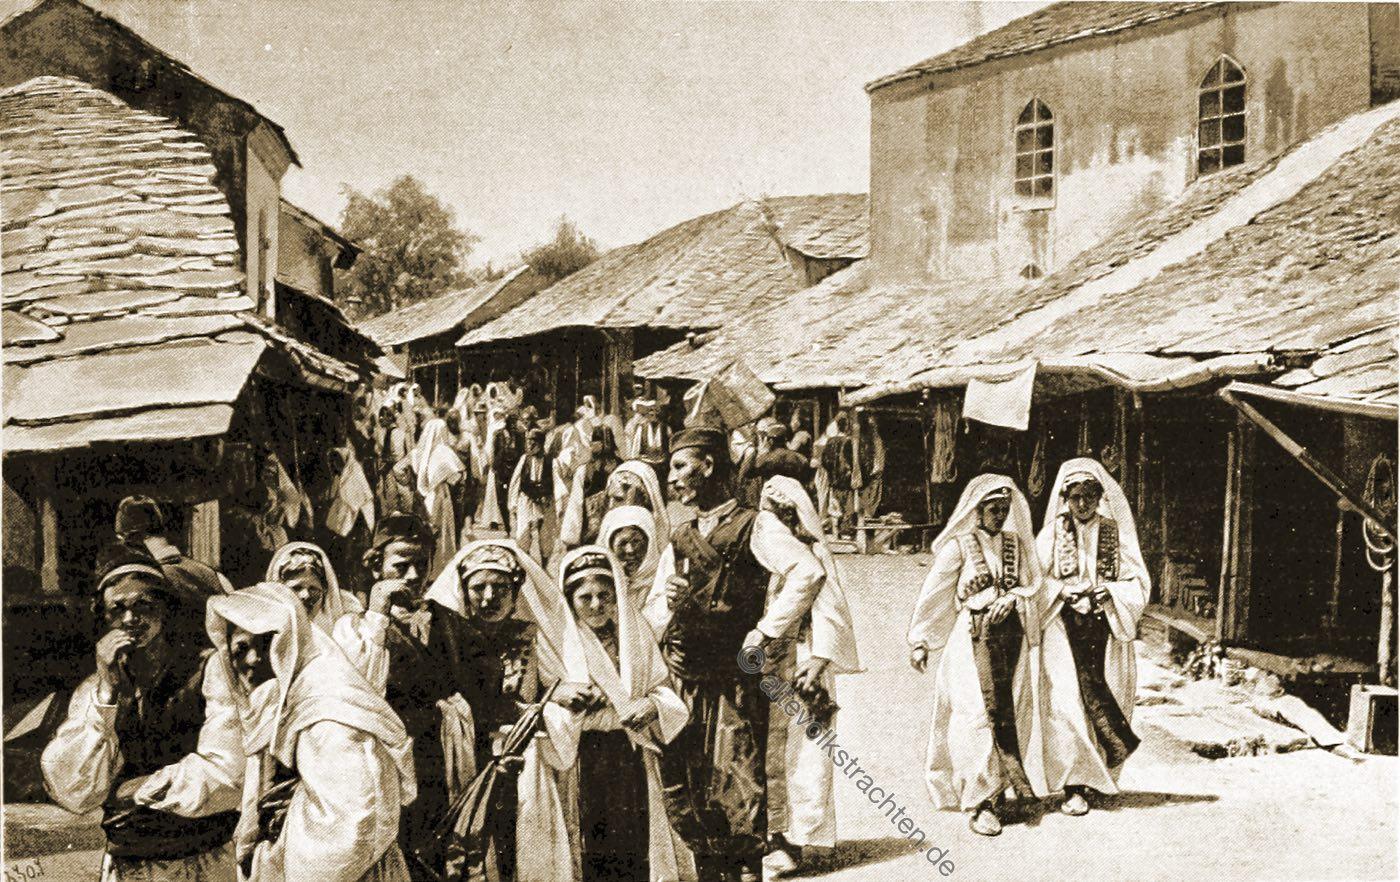 Basar, Mostar, Trachten, Bosnien, Herzegowina, Guillaume Capus, Reiseliteratur, Balkan